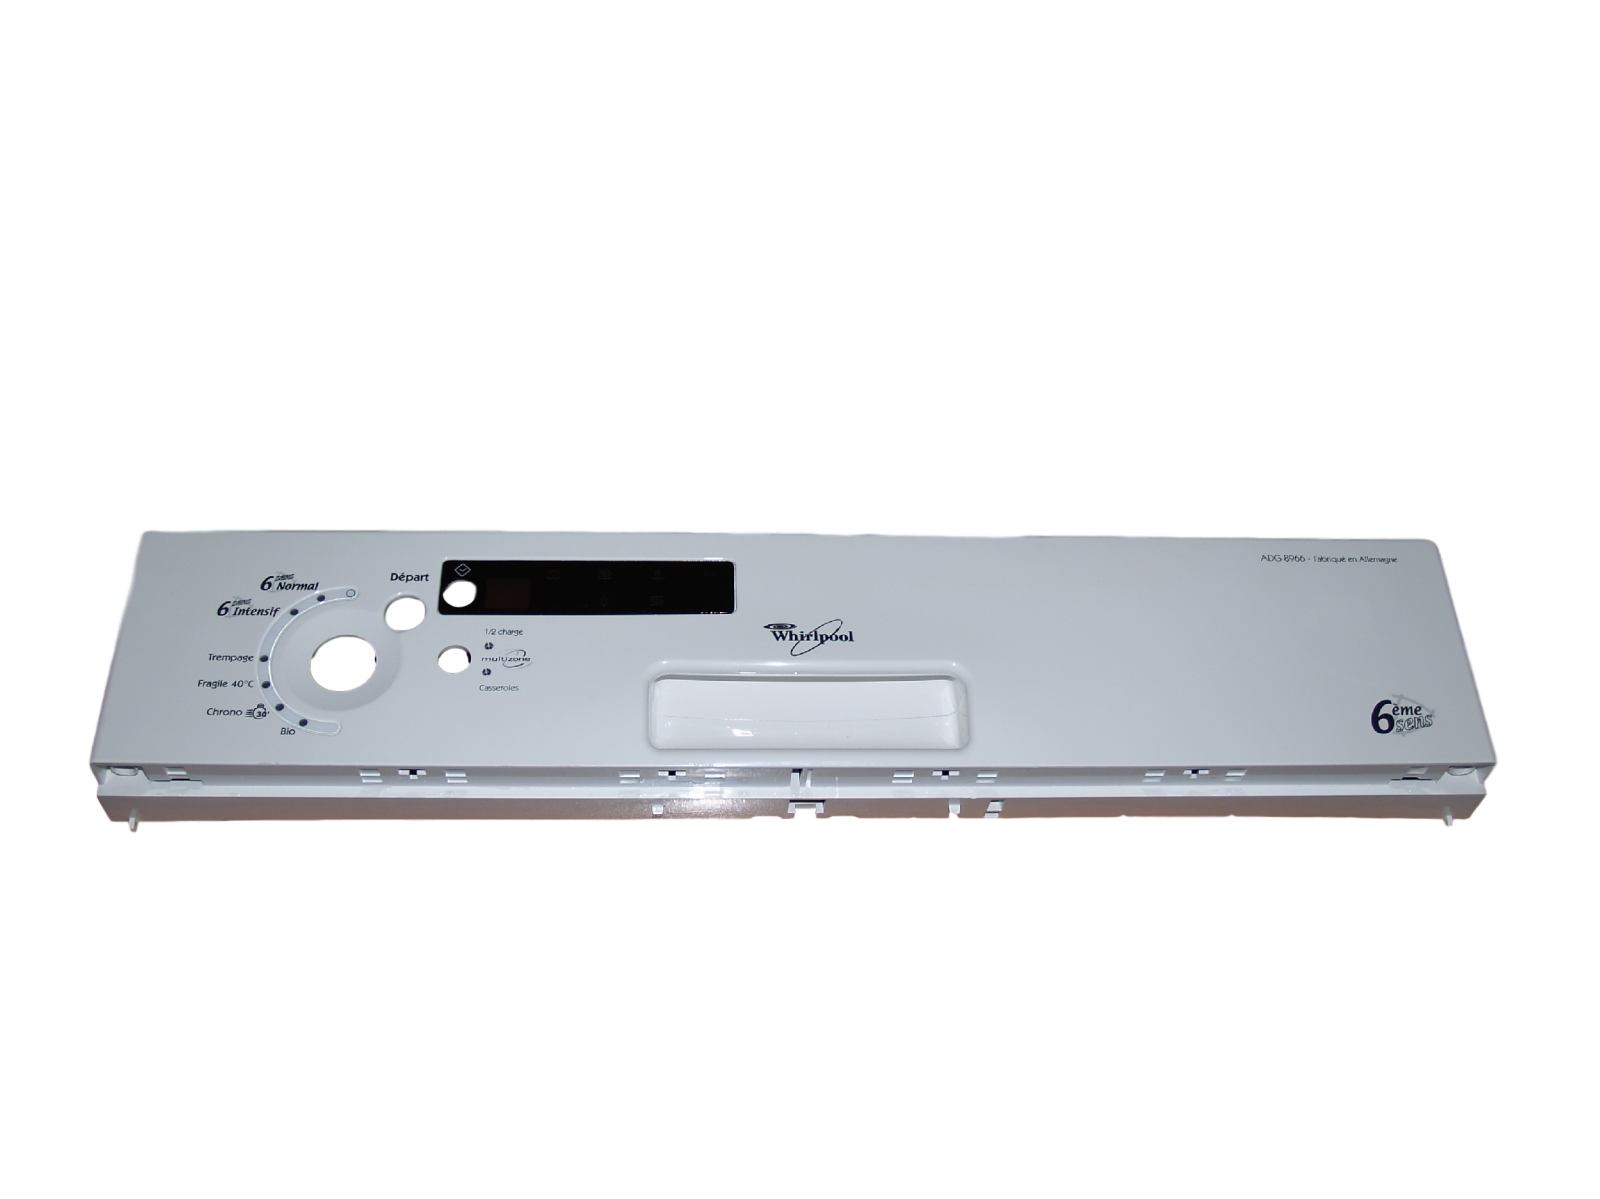 panel ovládací pro myčku Whirlpool - bílá barva - 481245371538 Whirlpool / Indesit